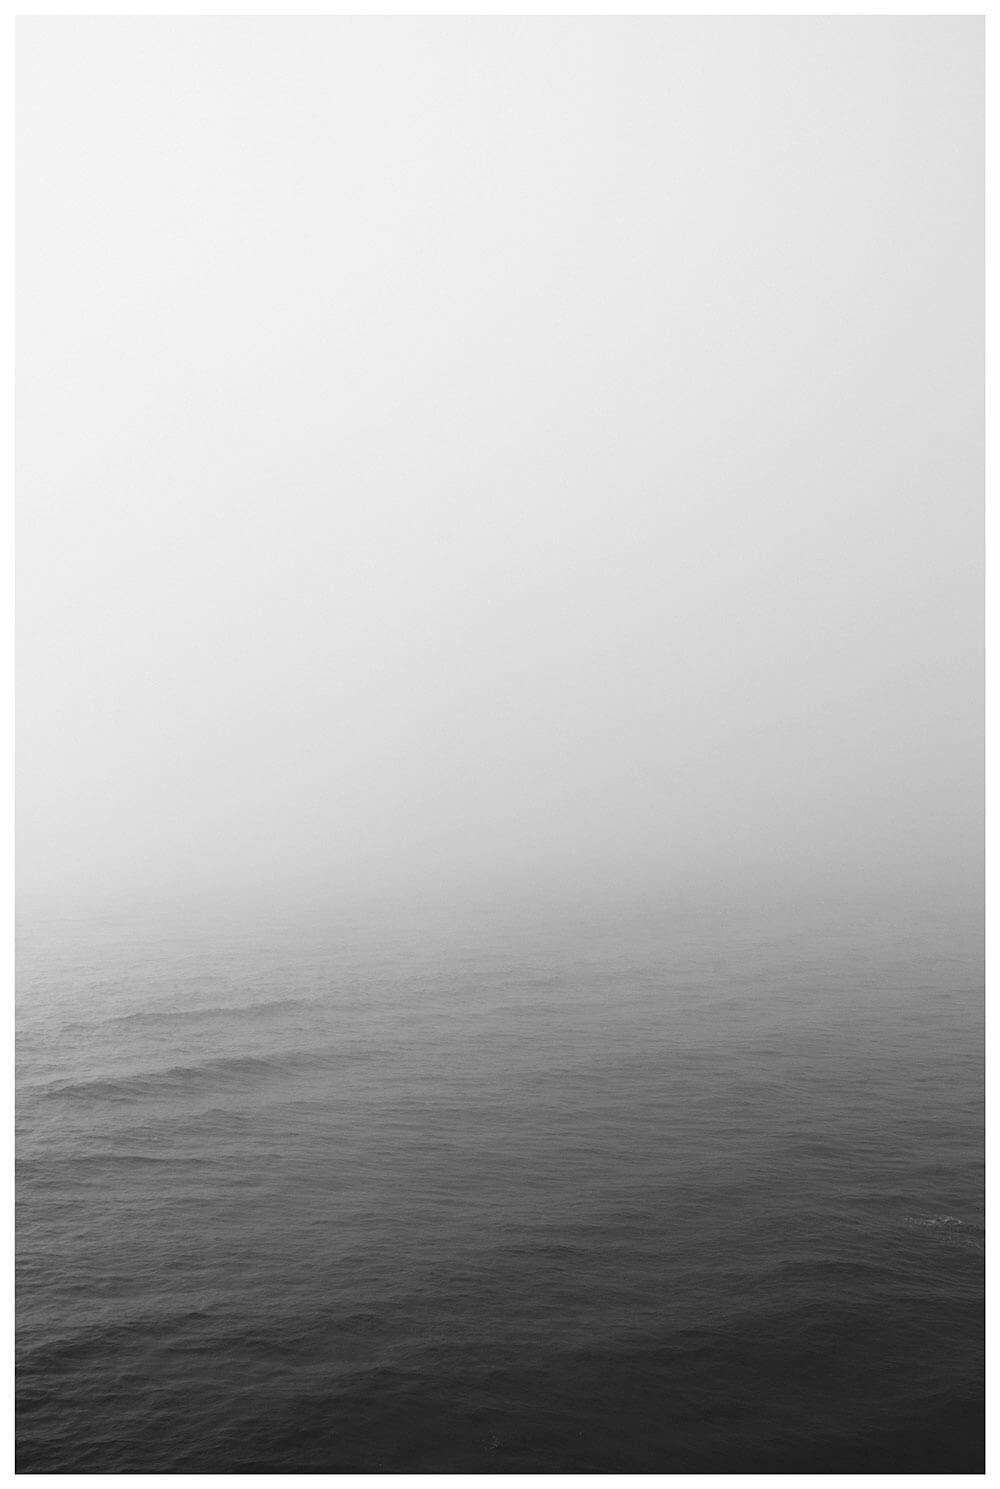 Black and white ocean horizon vertical poster print